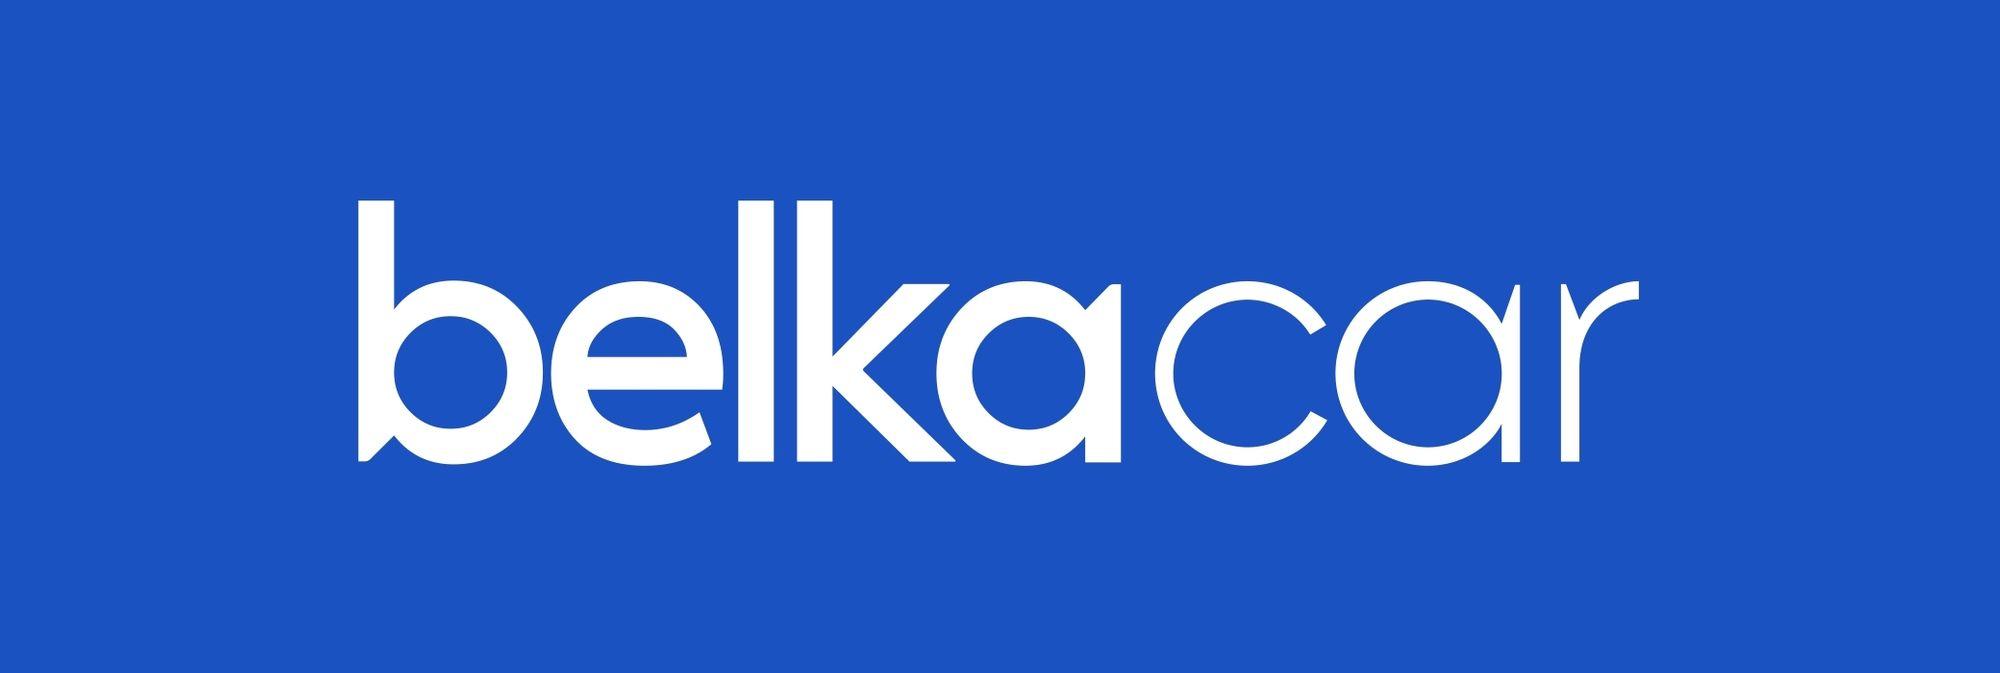 BelkaCar logo - Pushwoosh customer success story